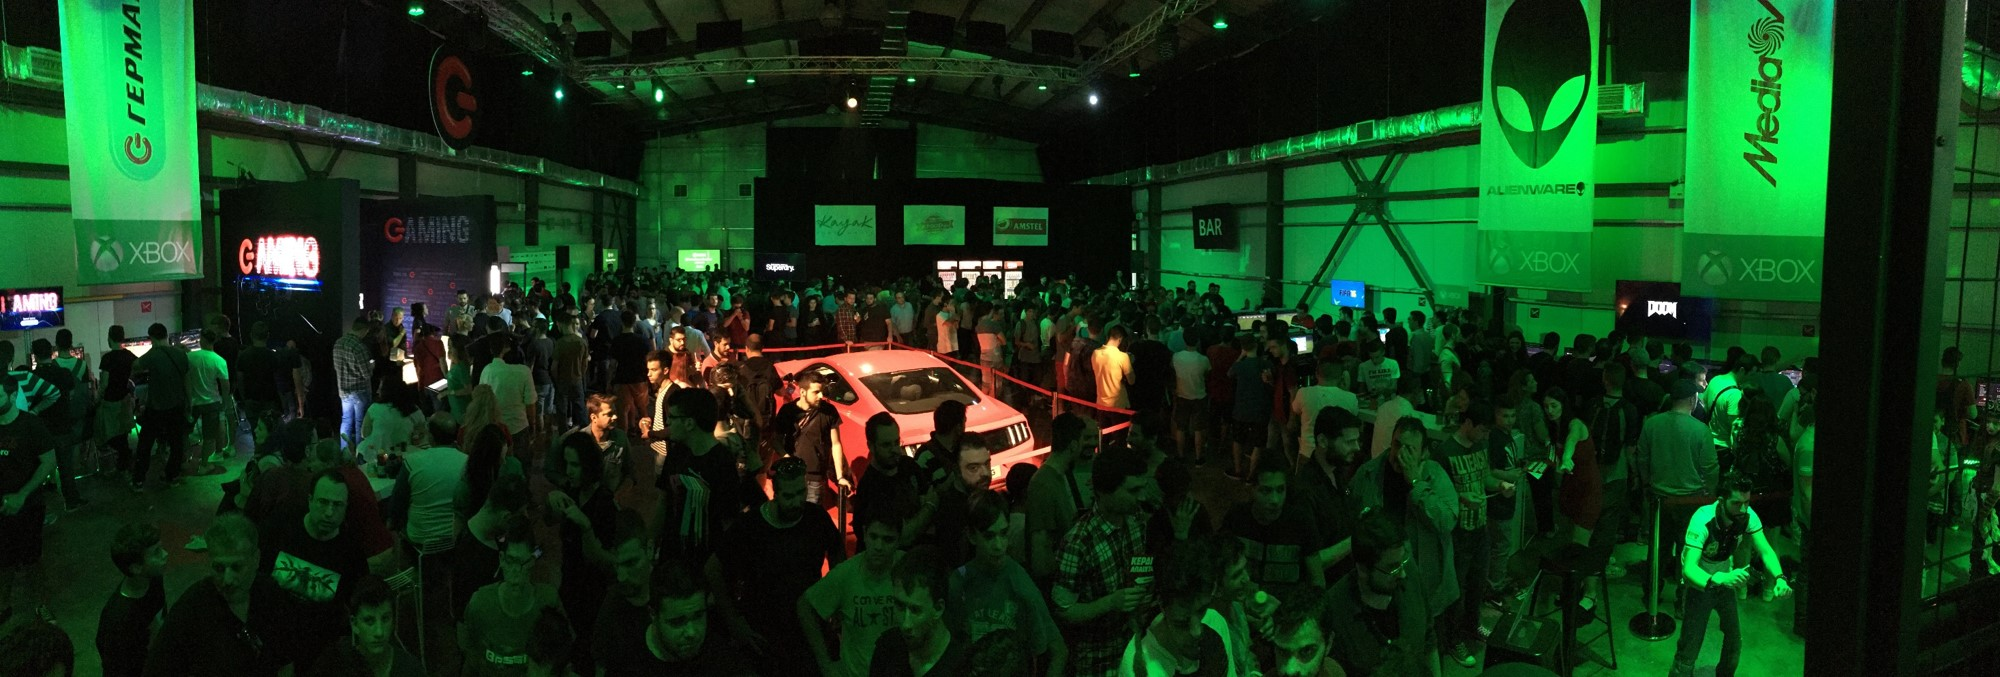 Xbox Arena Festival (1)